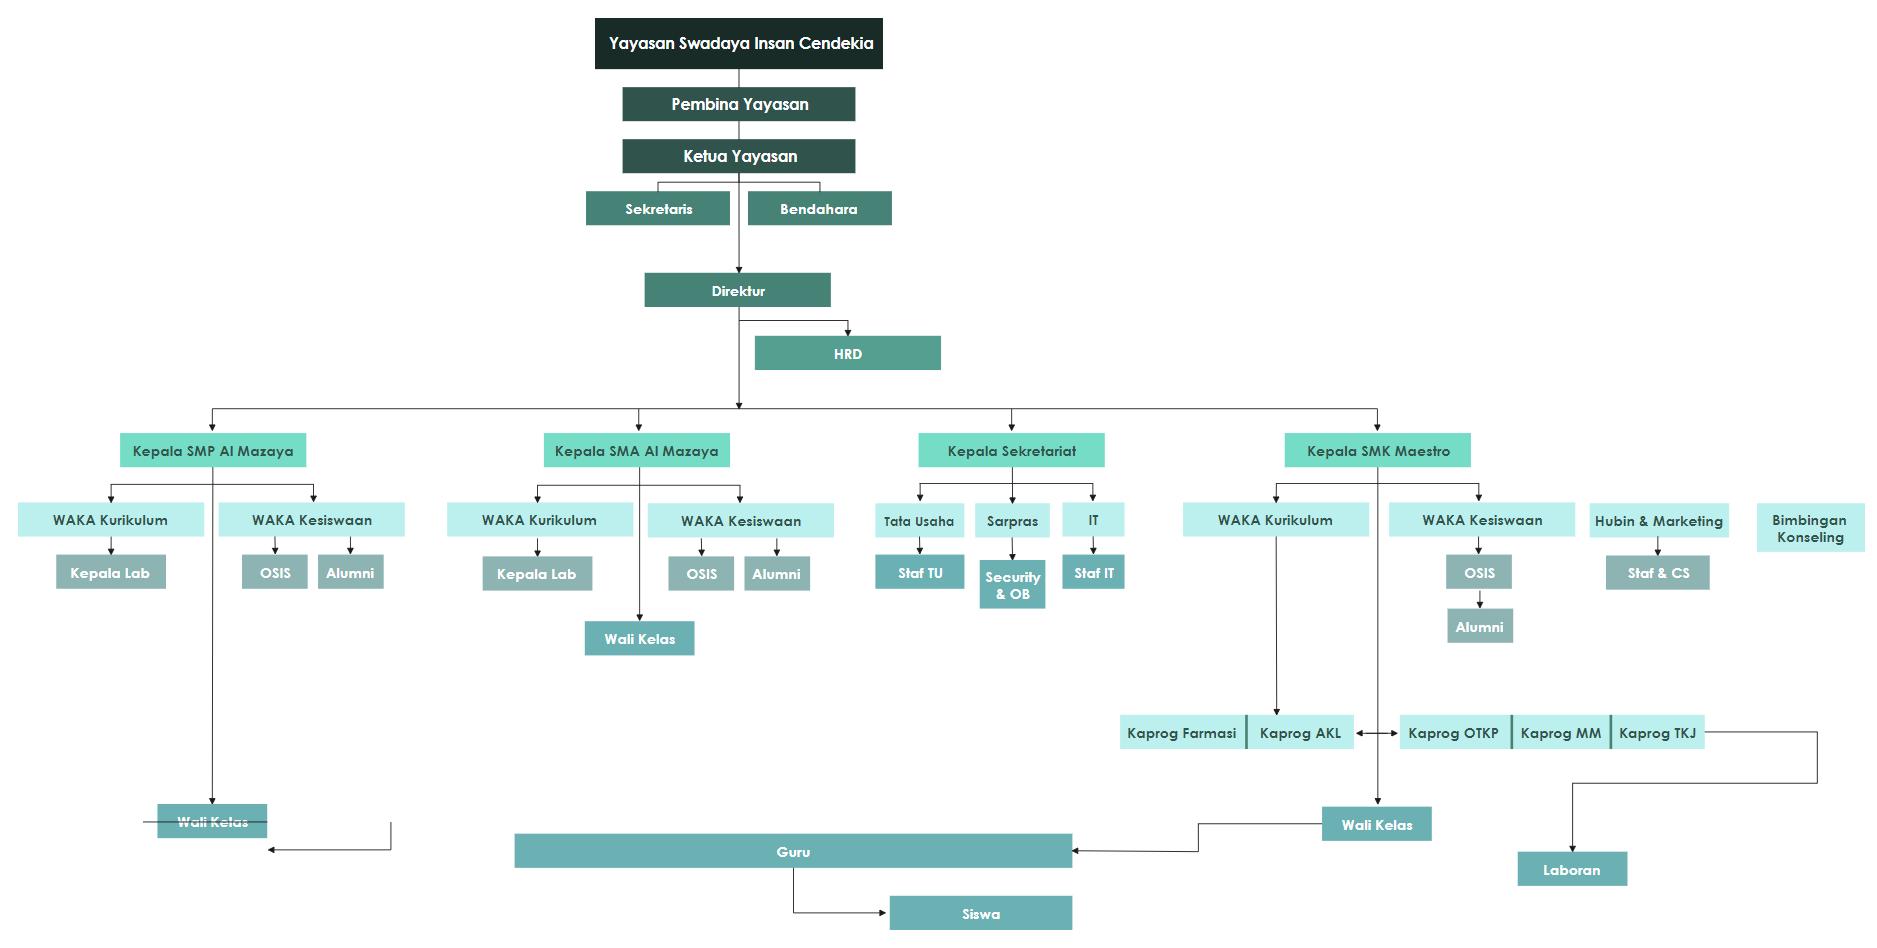 YSIC Organizational Structure